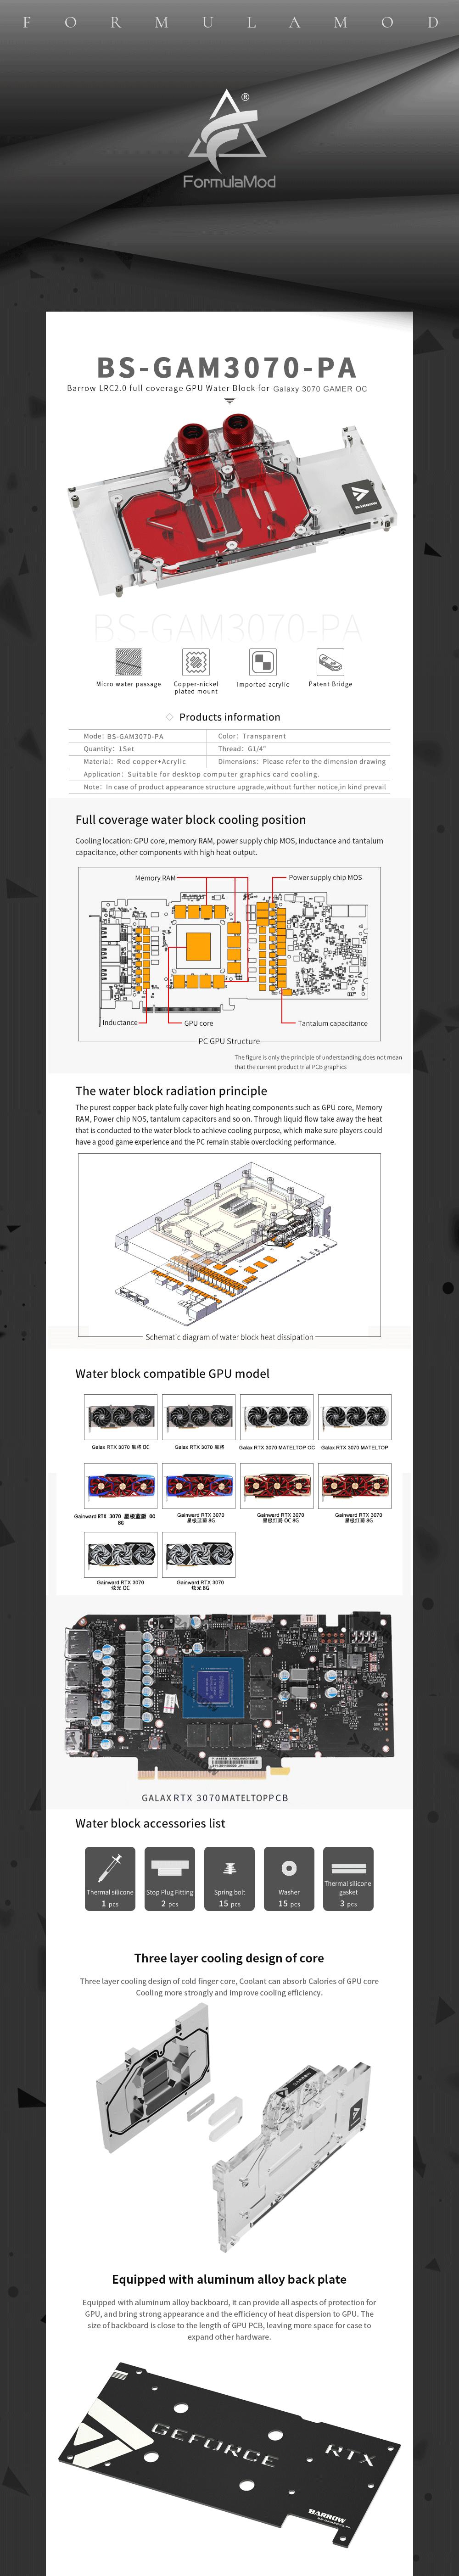 Barrow 3070 GPU Water Block for GALAX Geforce RTX 3070 MATELTOP, Full Cover ARGB GPU Cooler, BS-GAM3070-PA